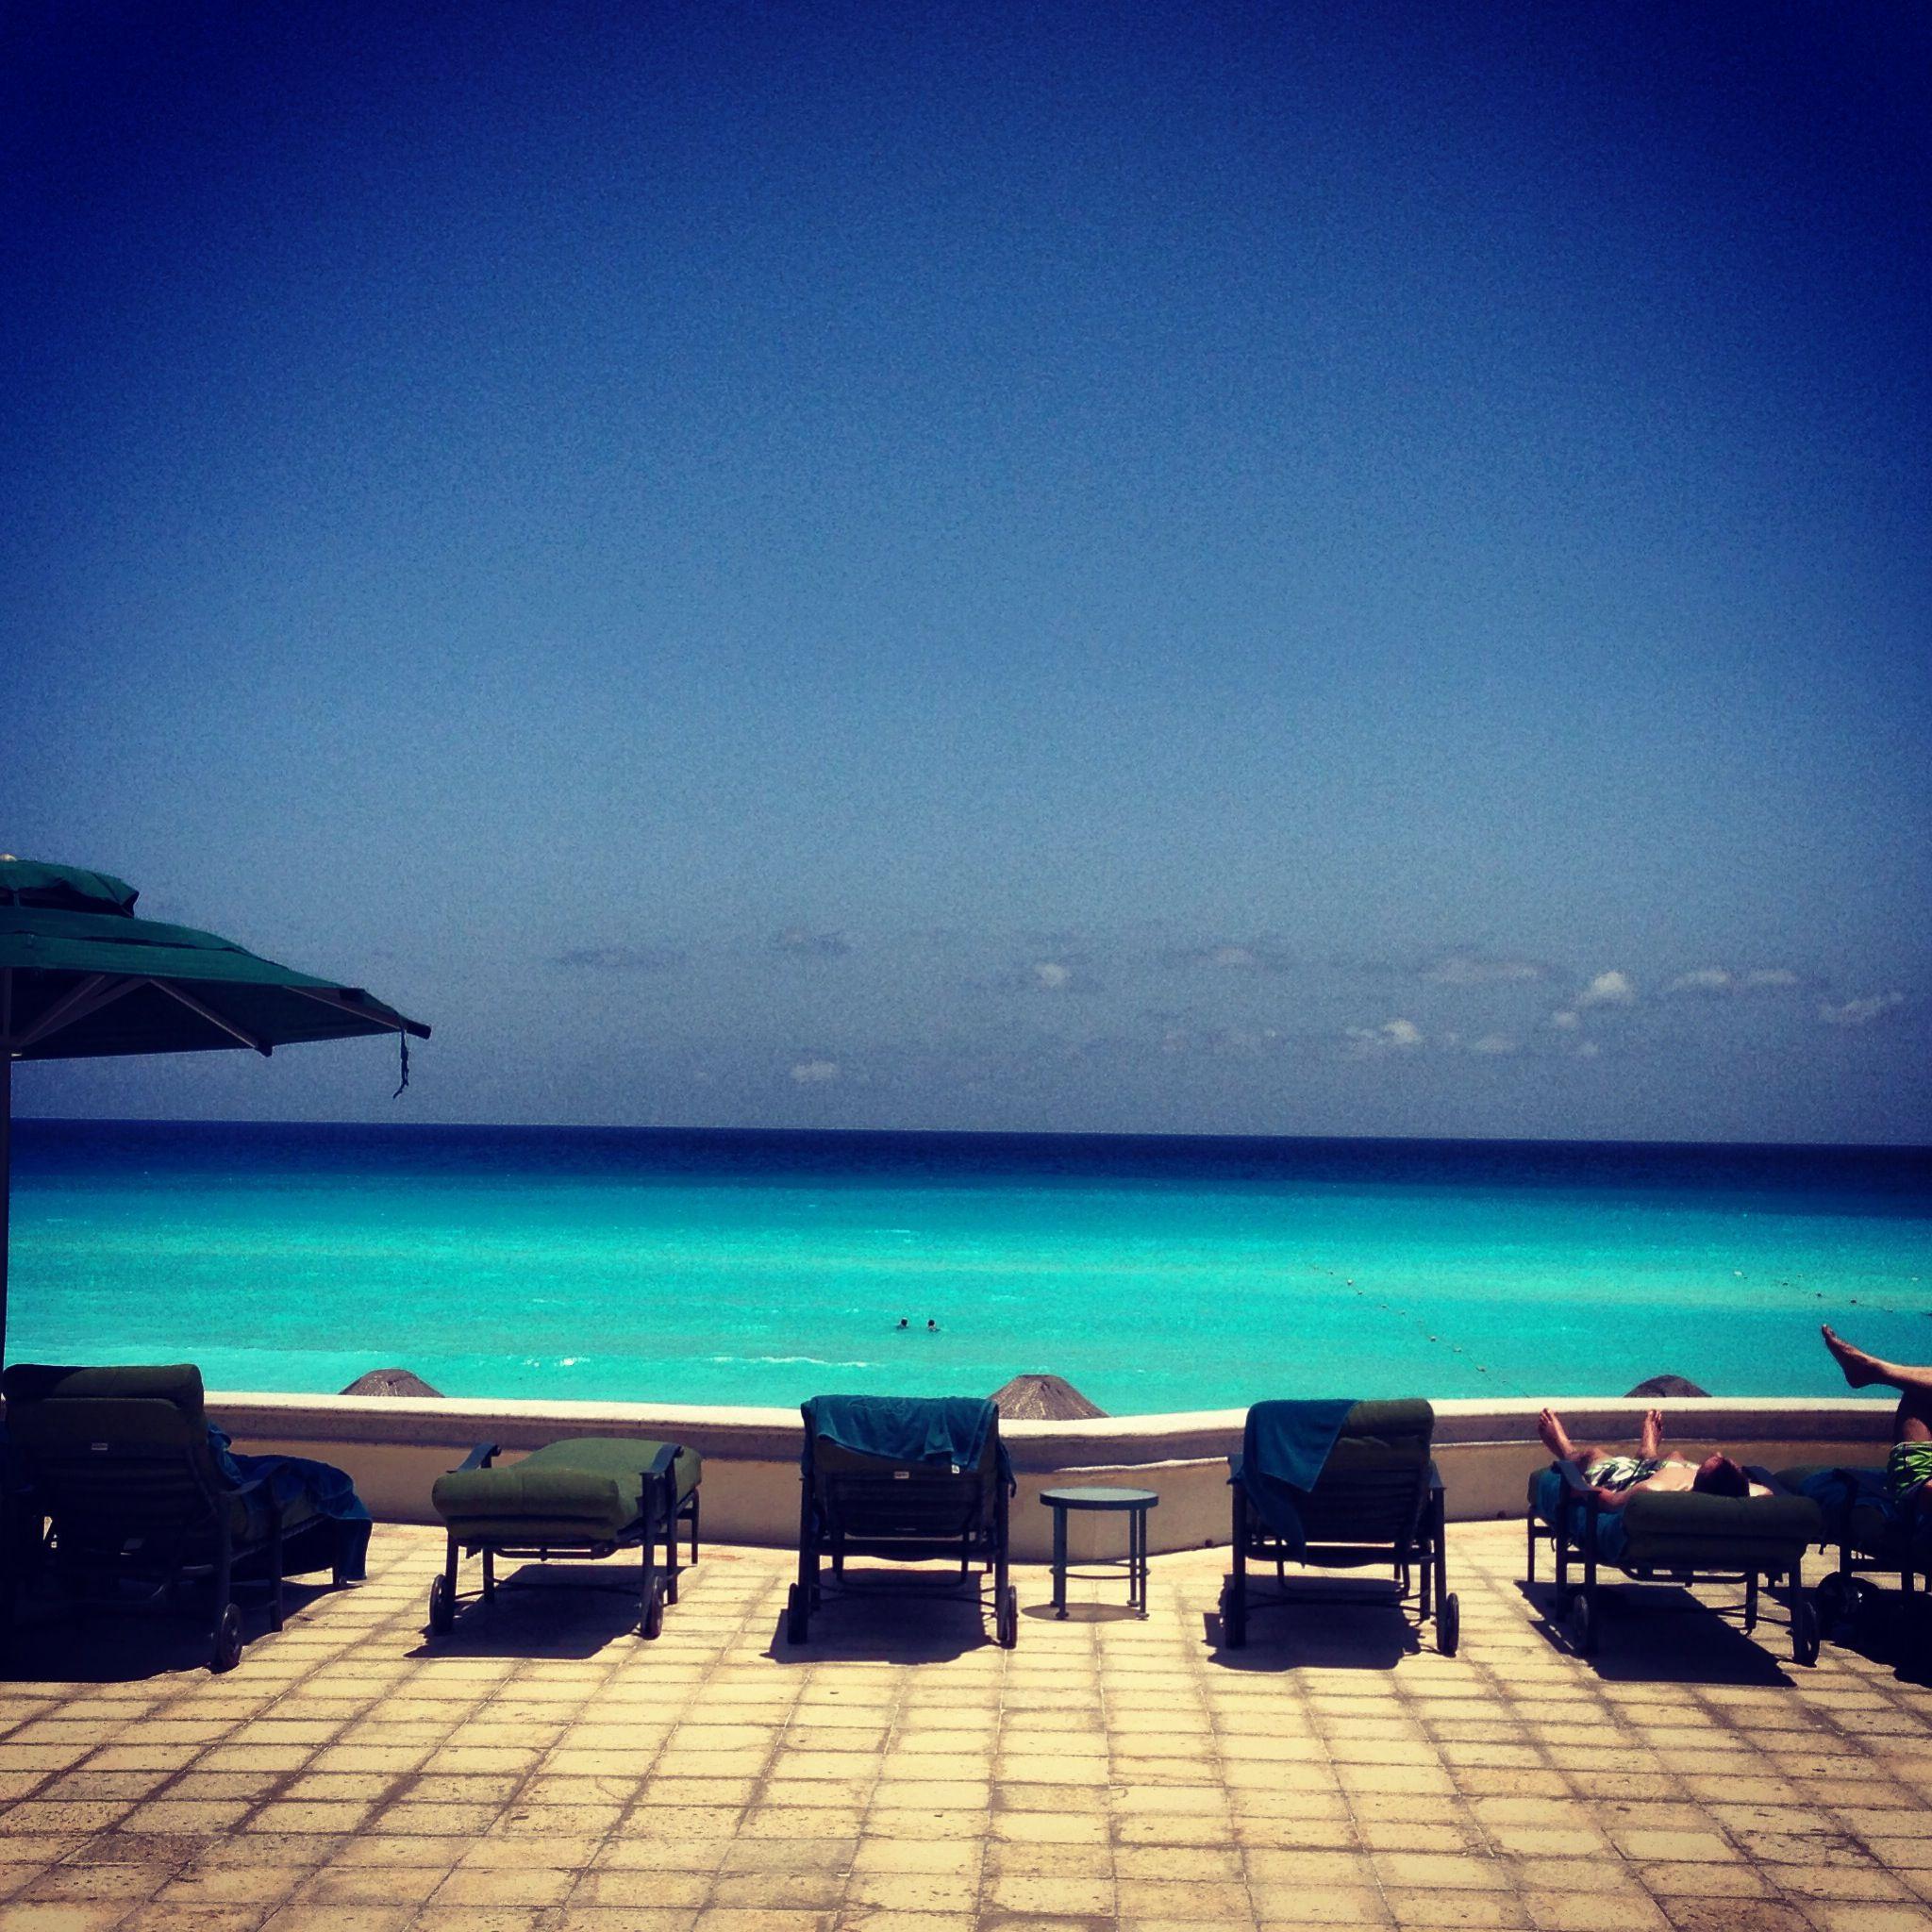 Cancun. JW Marriott. My New Favorite Place.